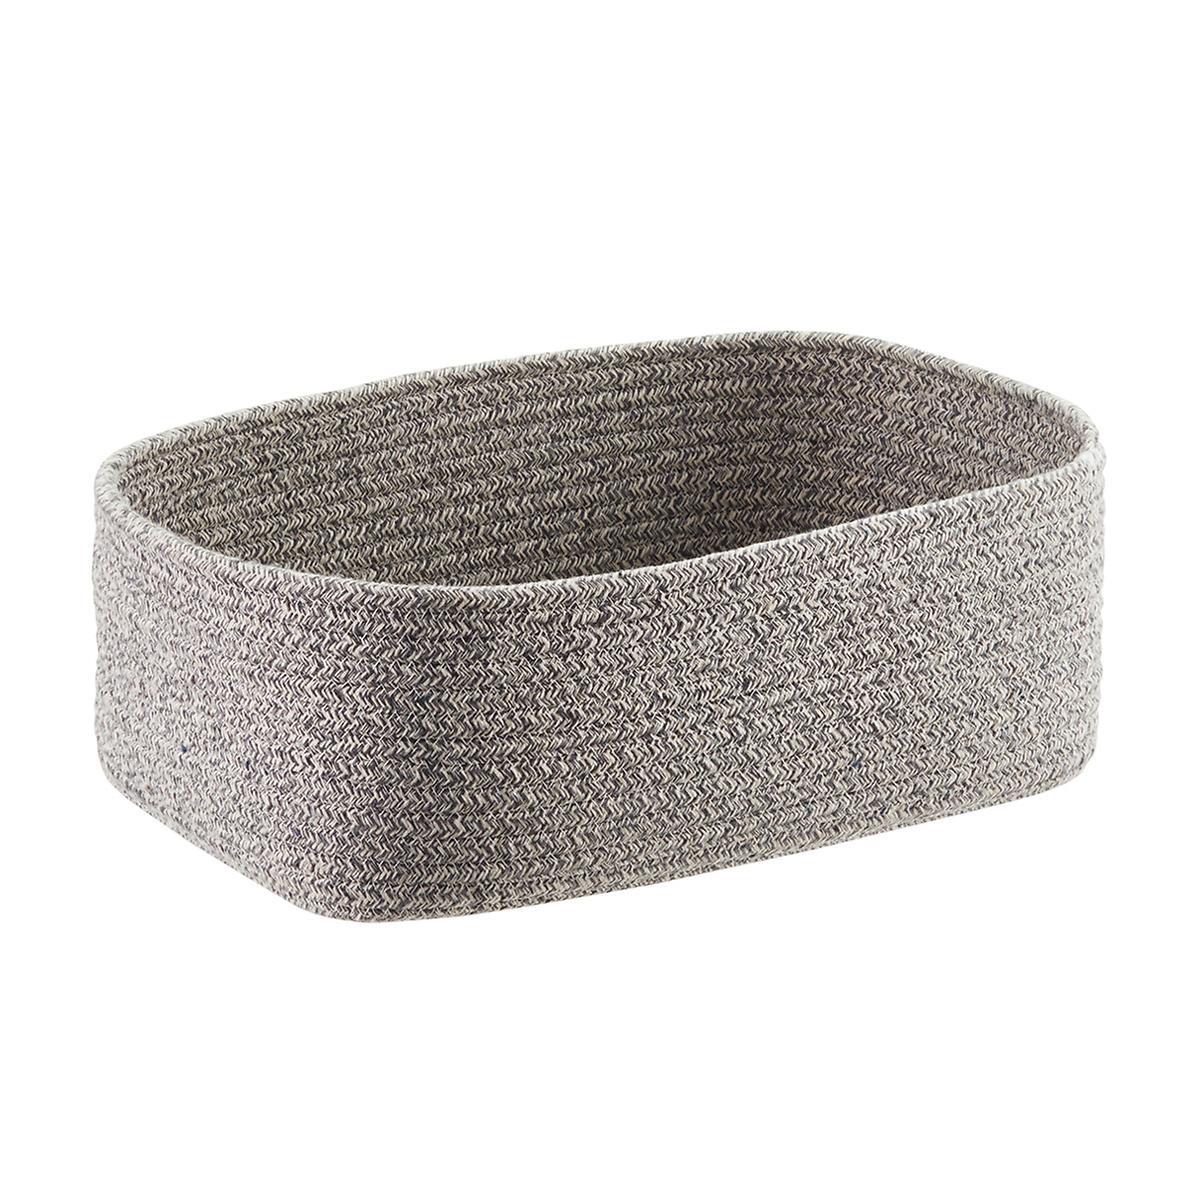 Grey Laguna Cotton Fabric Storage Bins